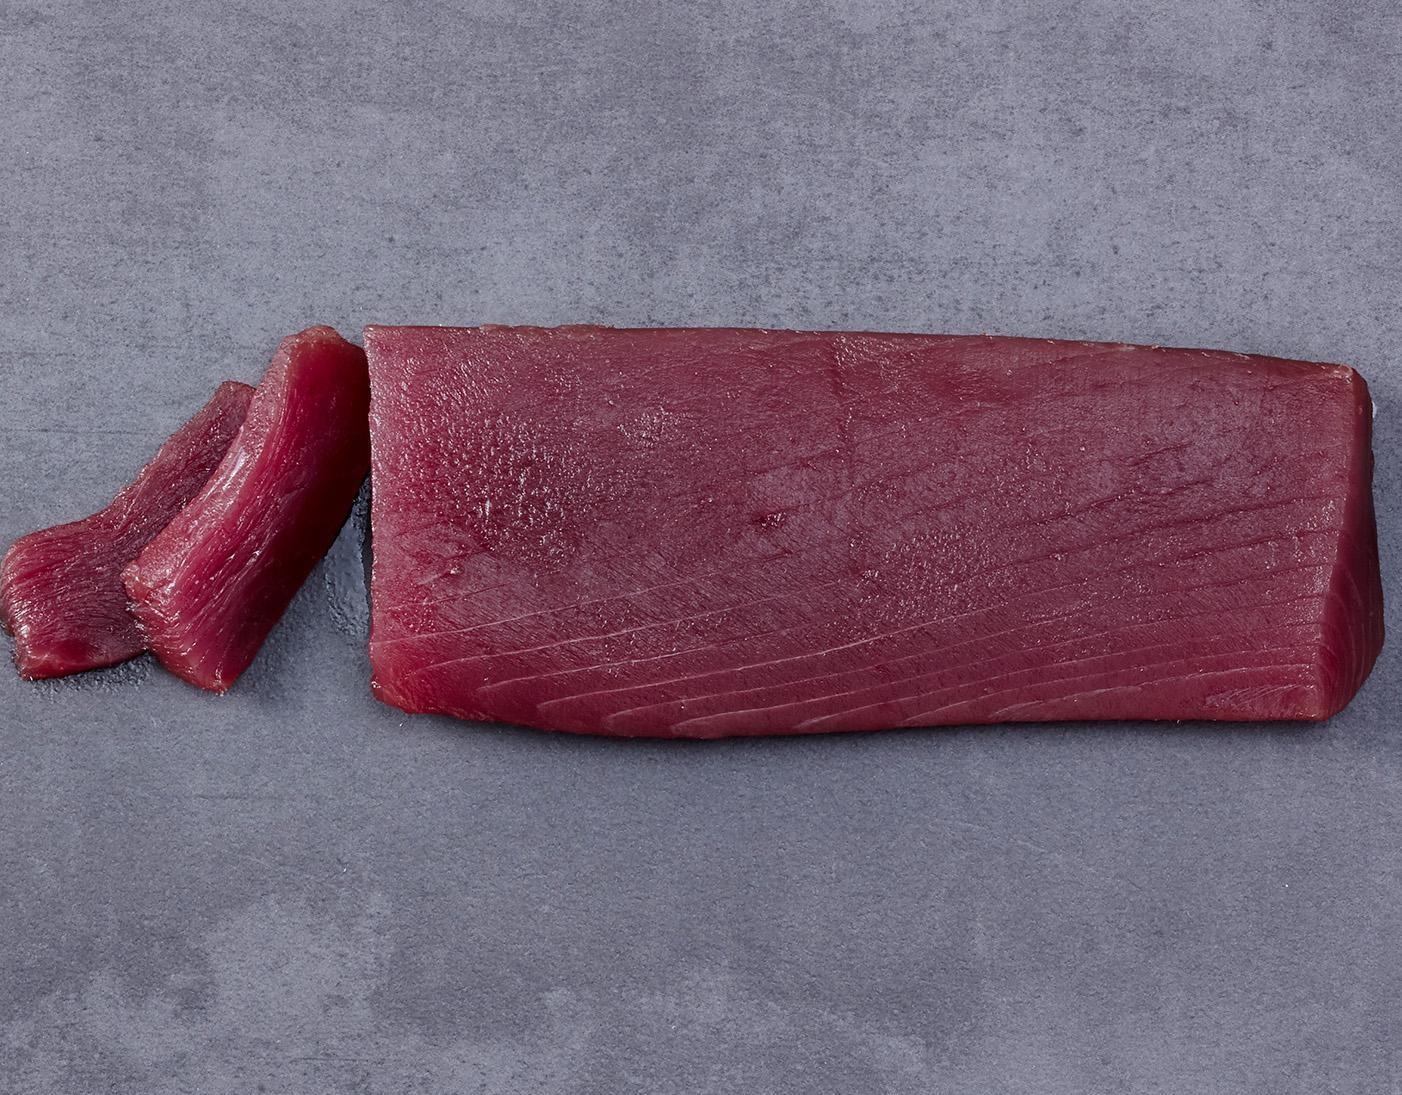 Thunfisch-Filet (Sashimi-Qualität) · Saku-Block jetzt kaufen!